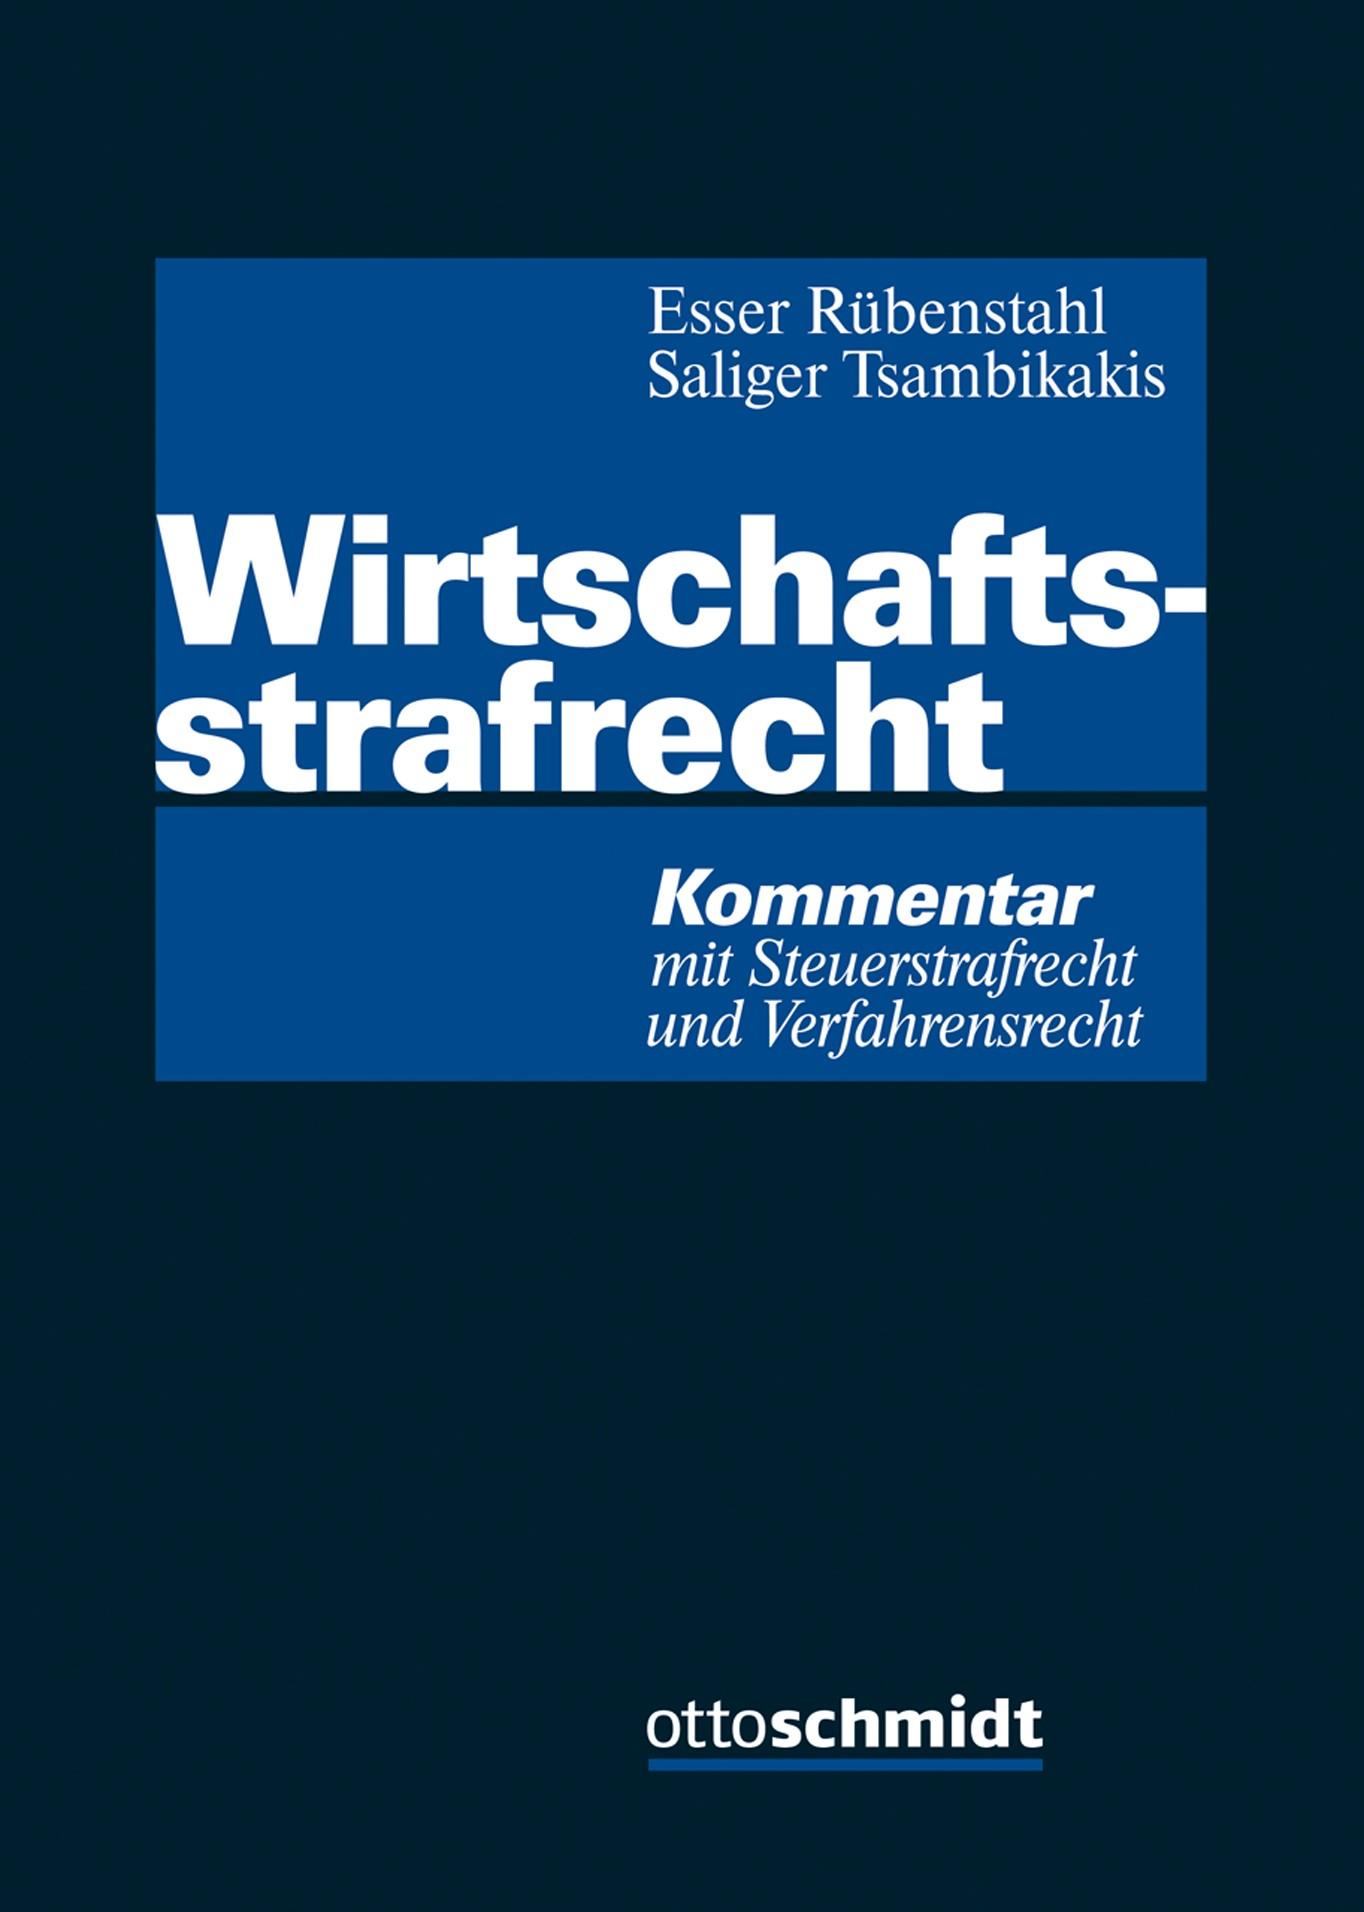 Wirtschaftsstrafrecht | Esser / Rübenstahl / Saliger / Tsambikakis (Hrsg.) | Buch (Cover)